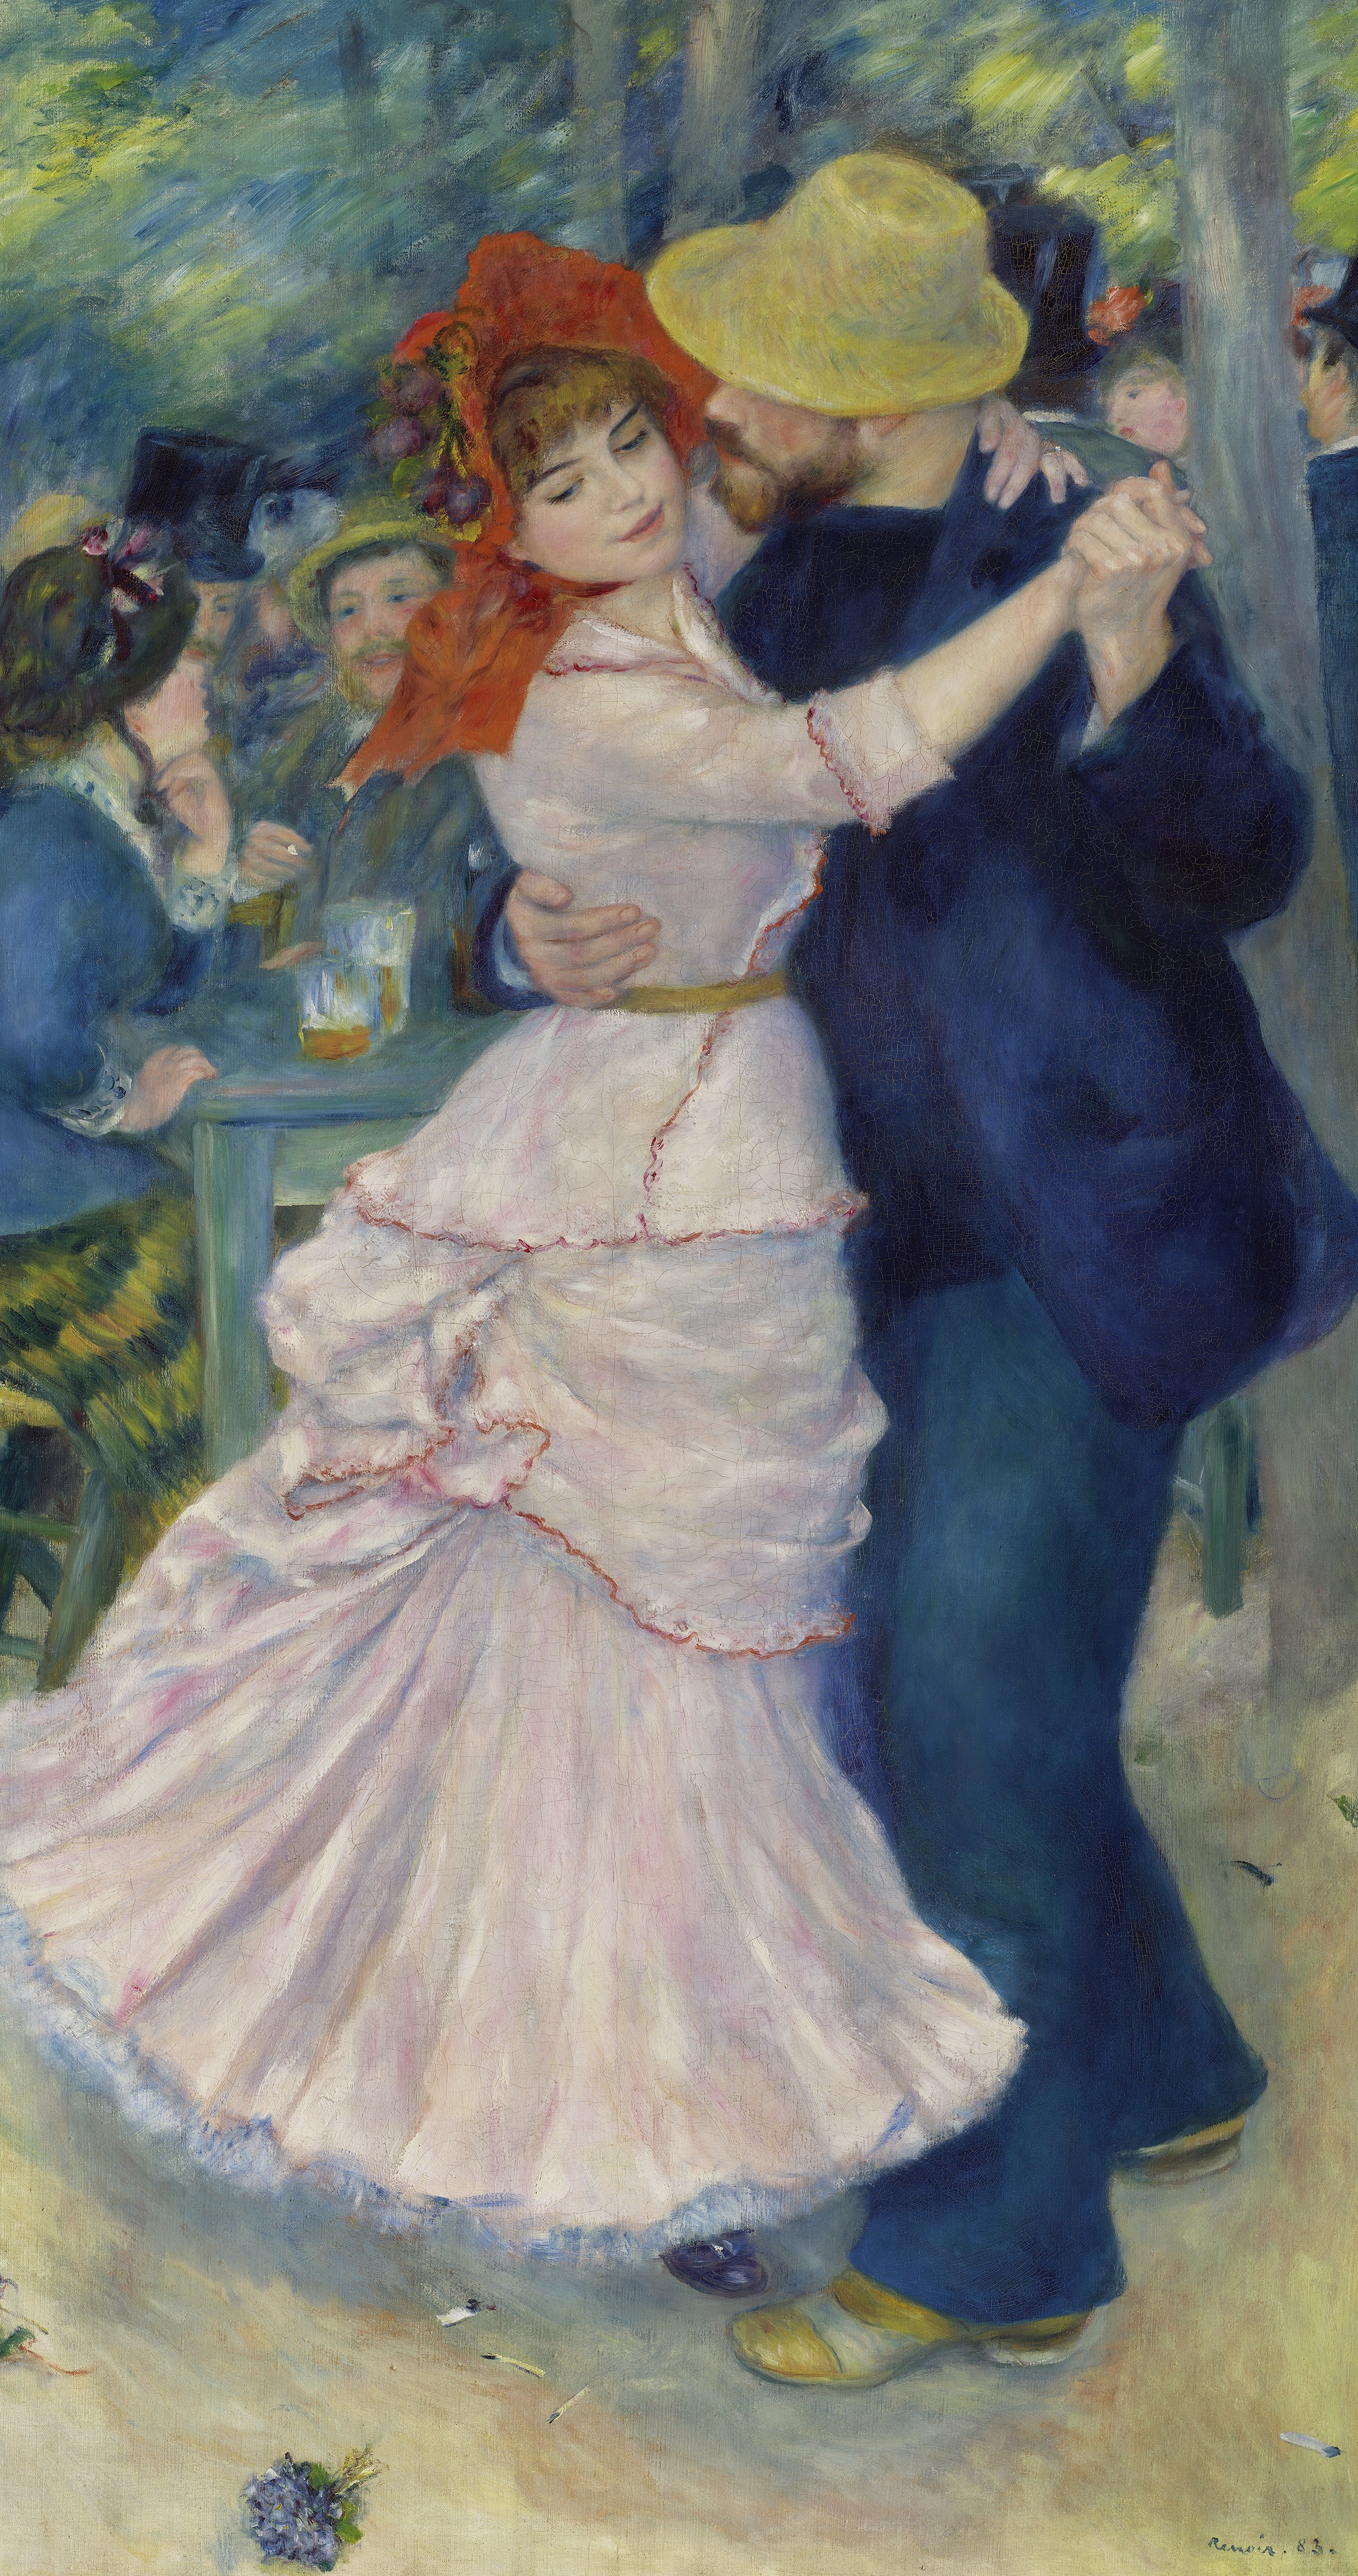 Renoir, Dance at Bougival, oil painting, Boston museum of fine art Suzanne Valadon, Paul kohlt